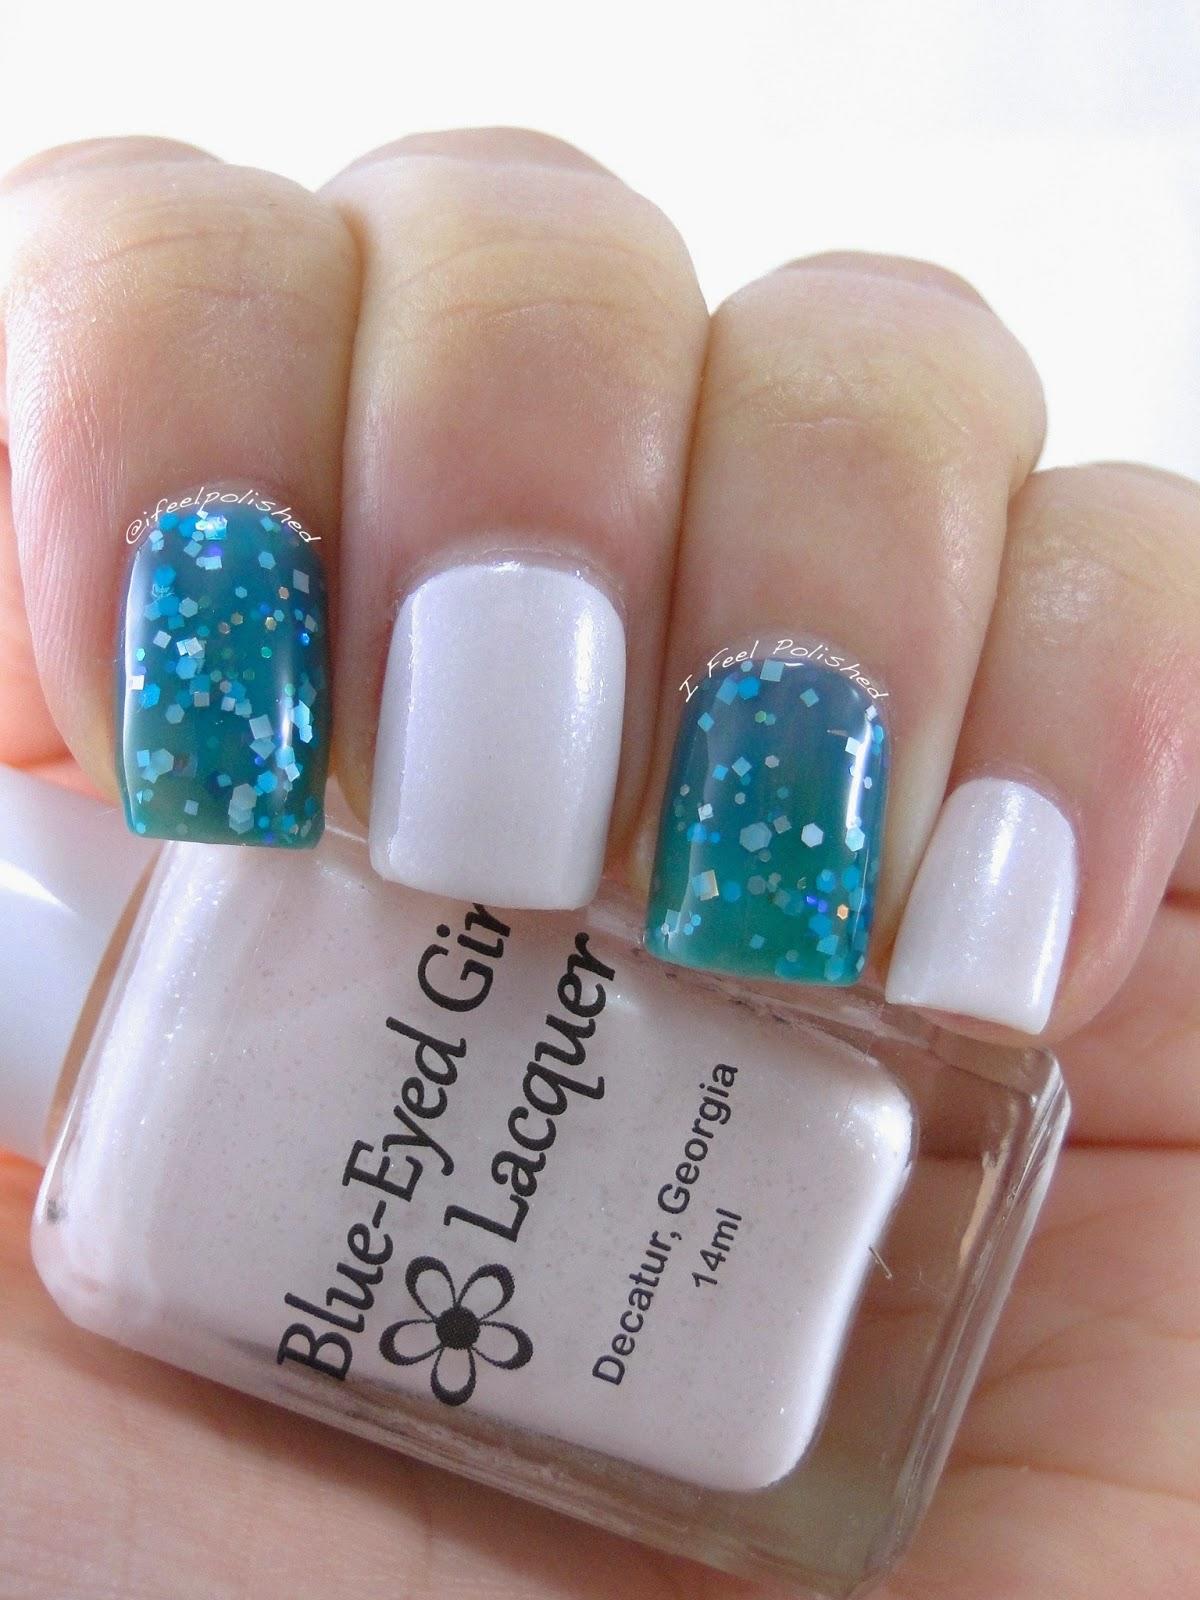 Ocean Nail Polish